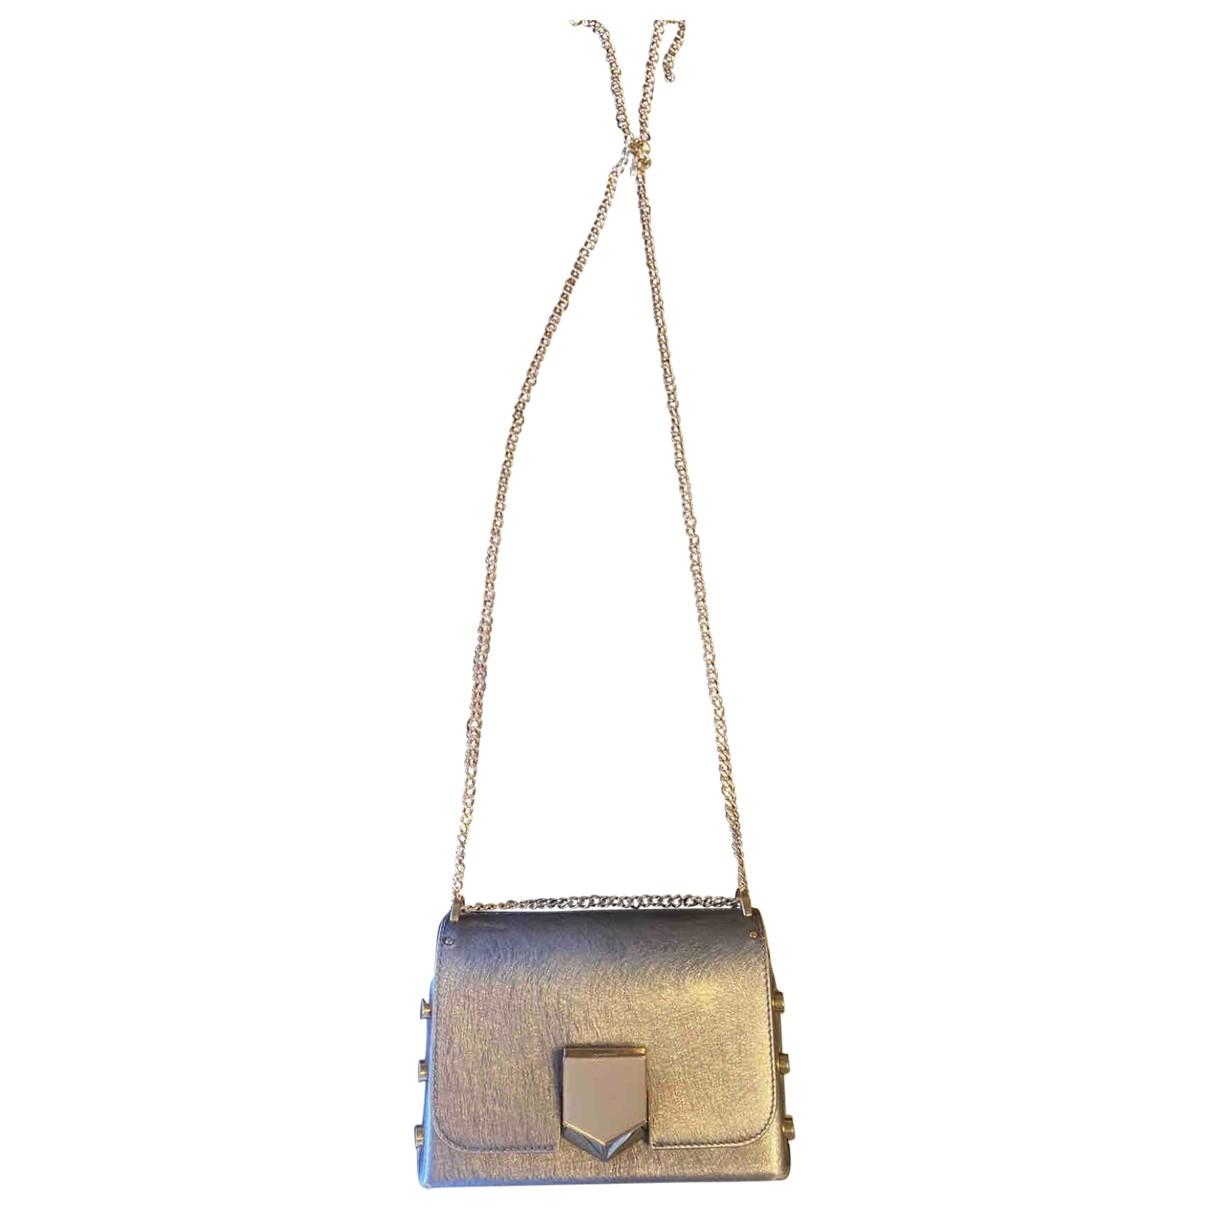 Jimmy Choo Lockett Handtasche in  Anthrazit Leder